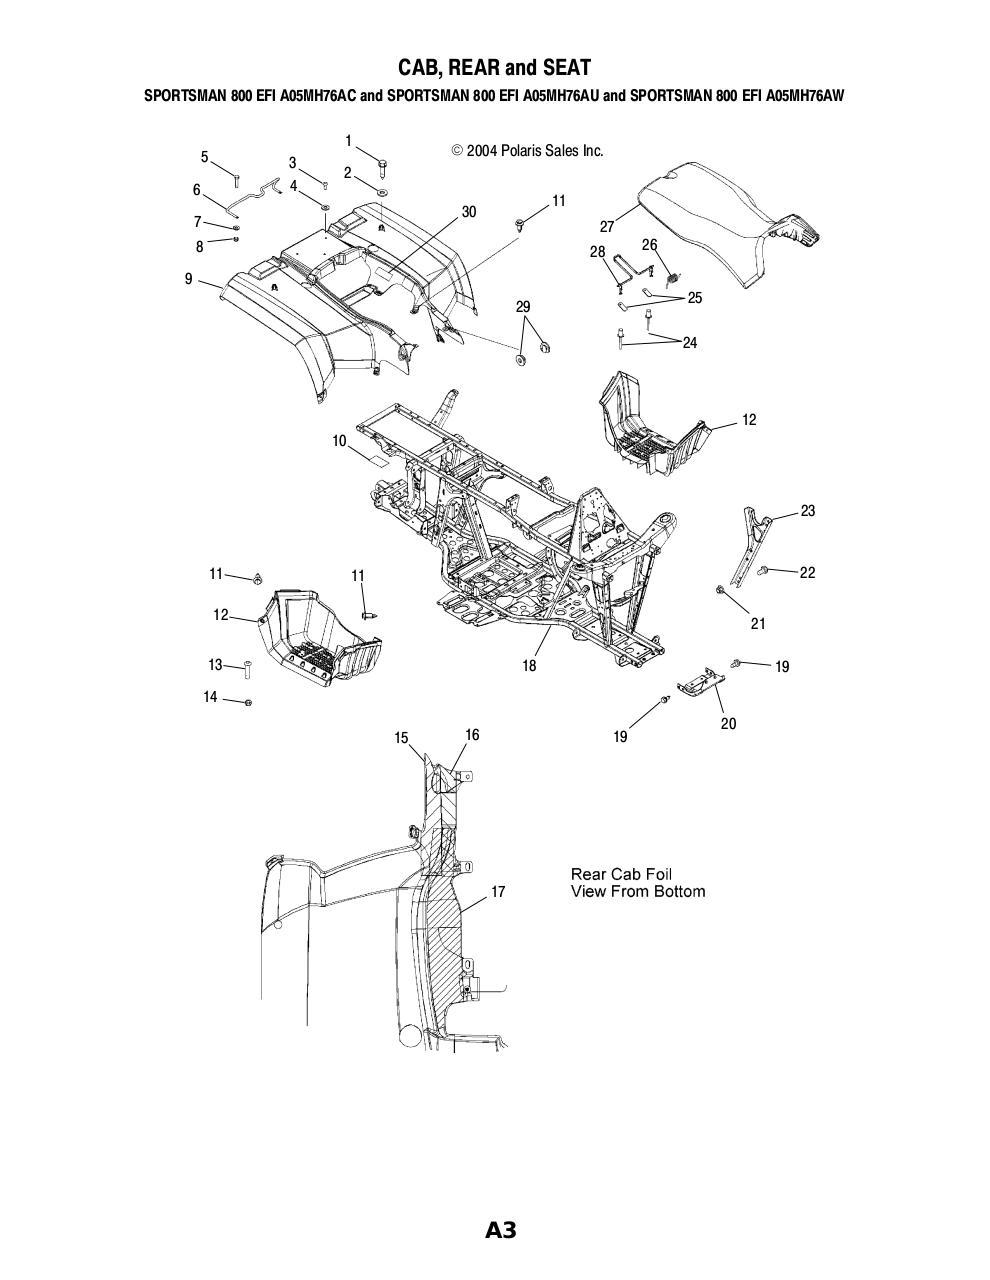 2006 Polaris Sportsman 800 Wiring Diagram. Engine. Wiring